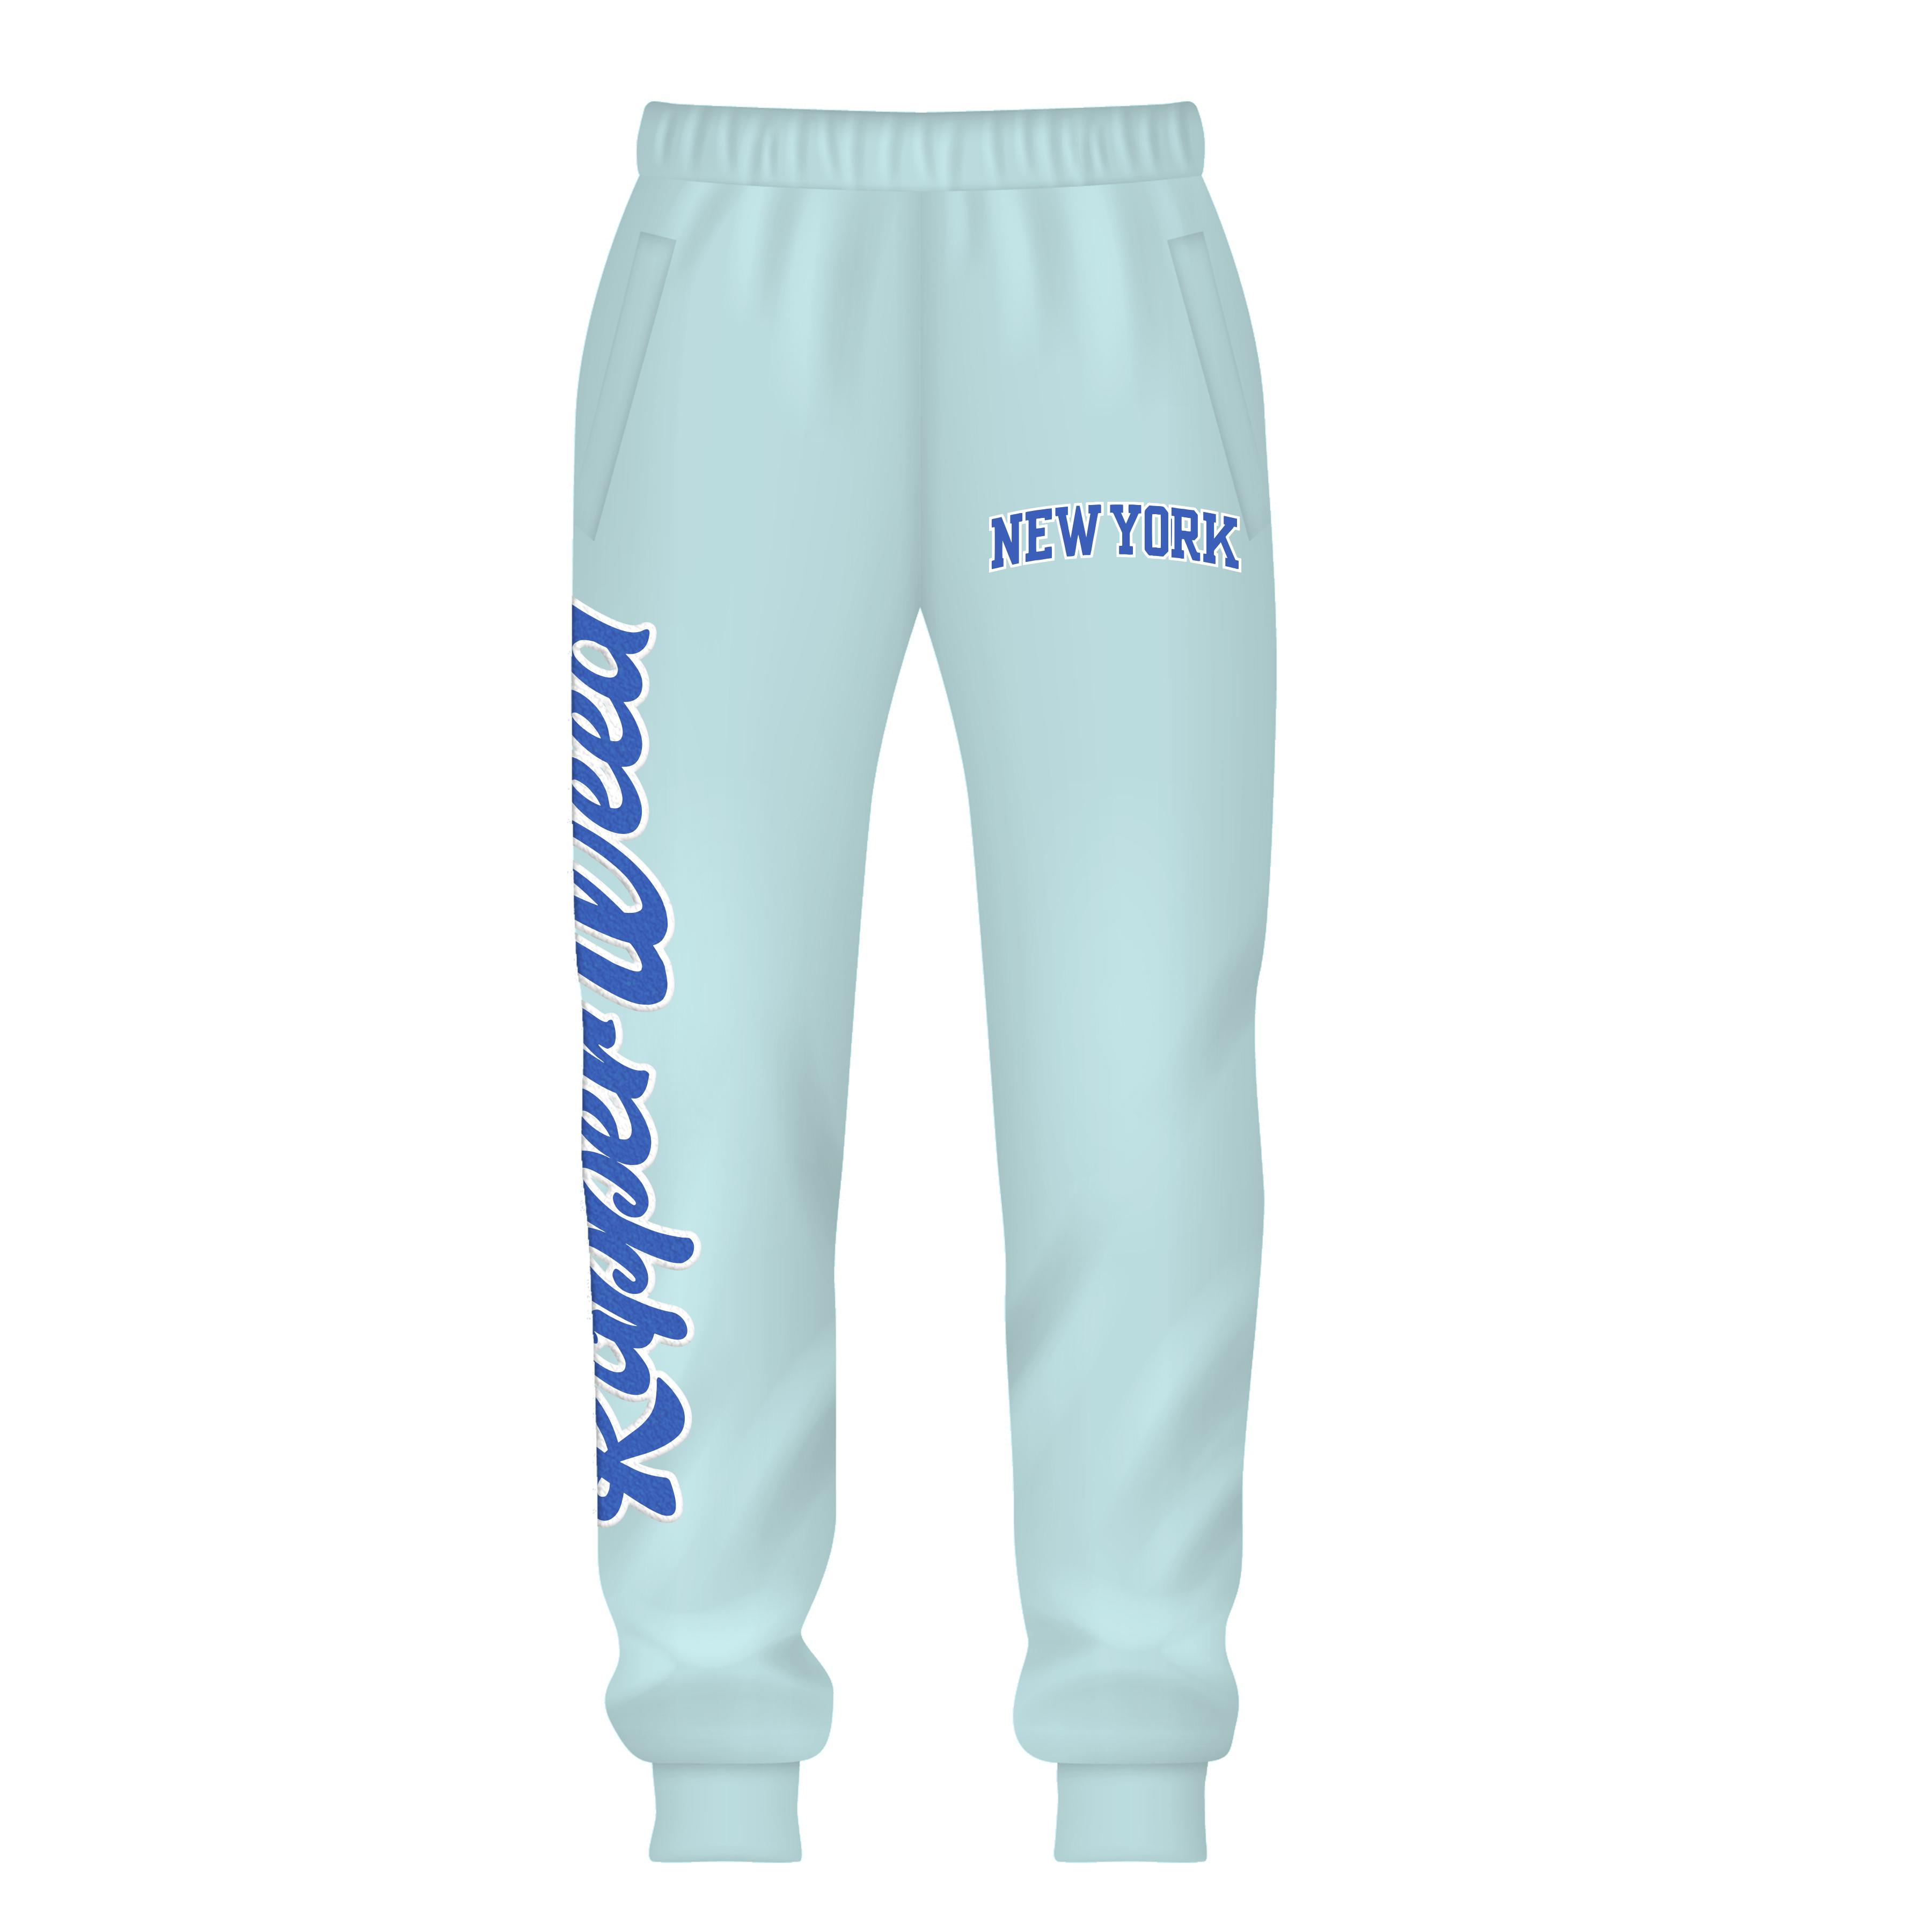 RW New York Sweatpants